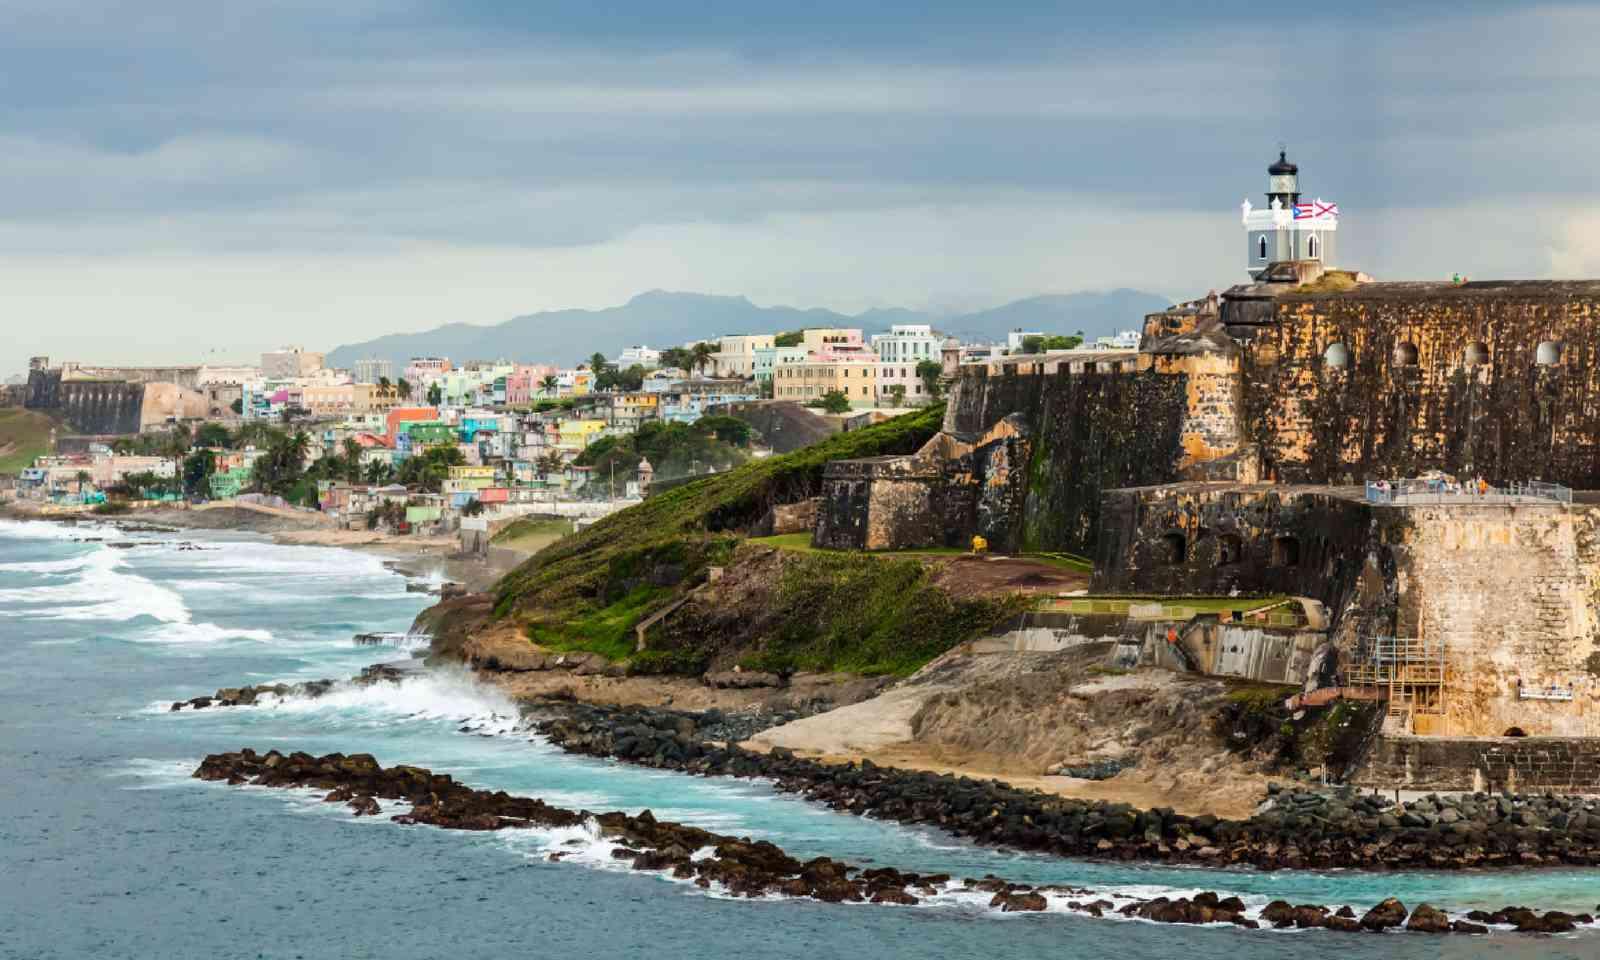 San Juan, Puerto Rico (Shutterstock)